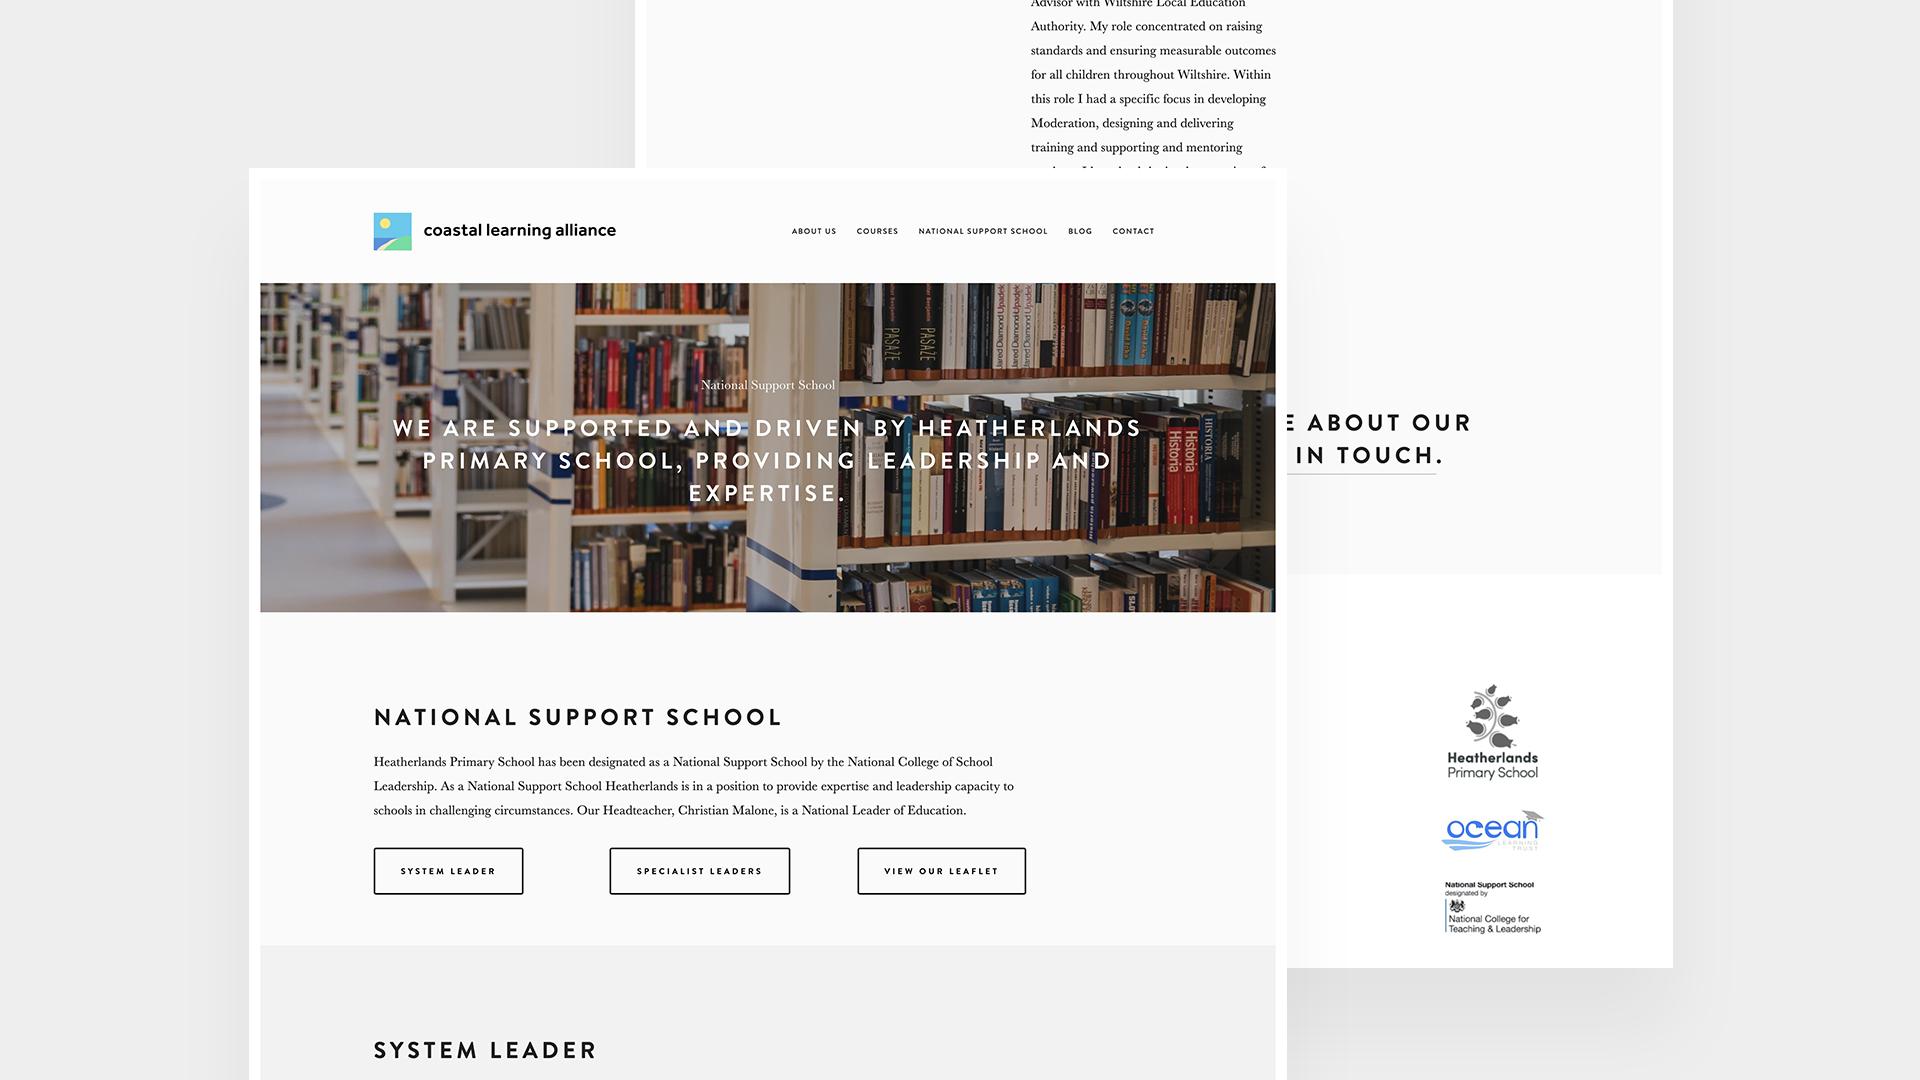 05-Lobo-Creative-Coastal-Learning-Alliance-website-digital-design-case-study.jpg